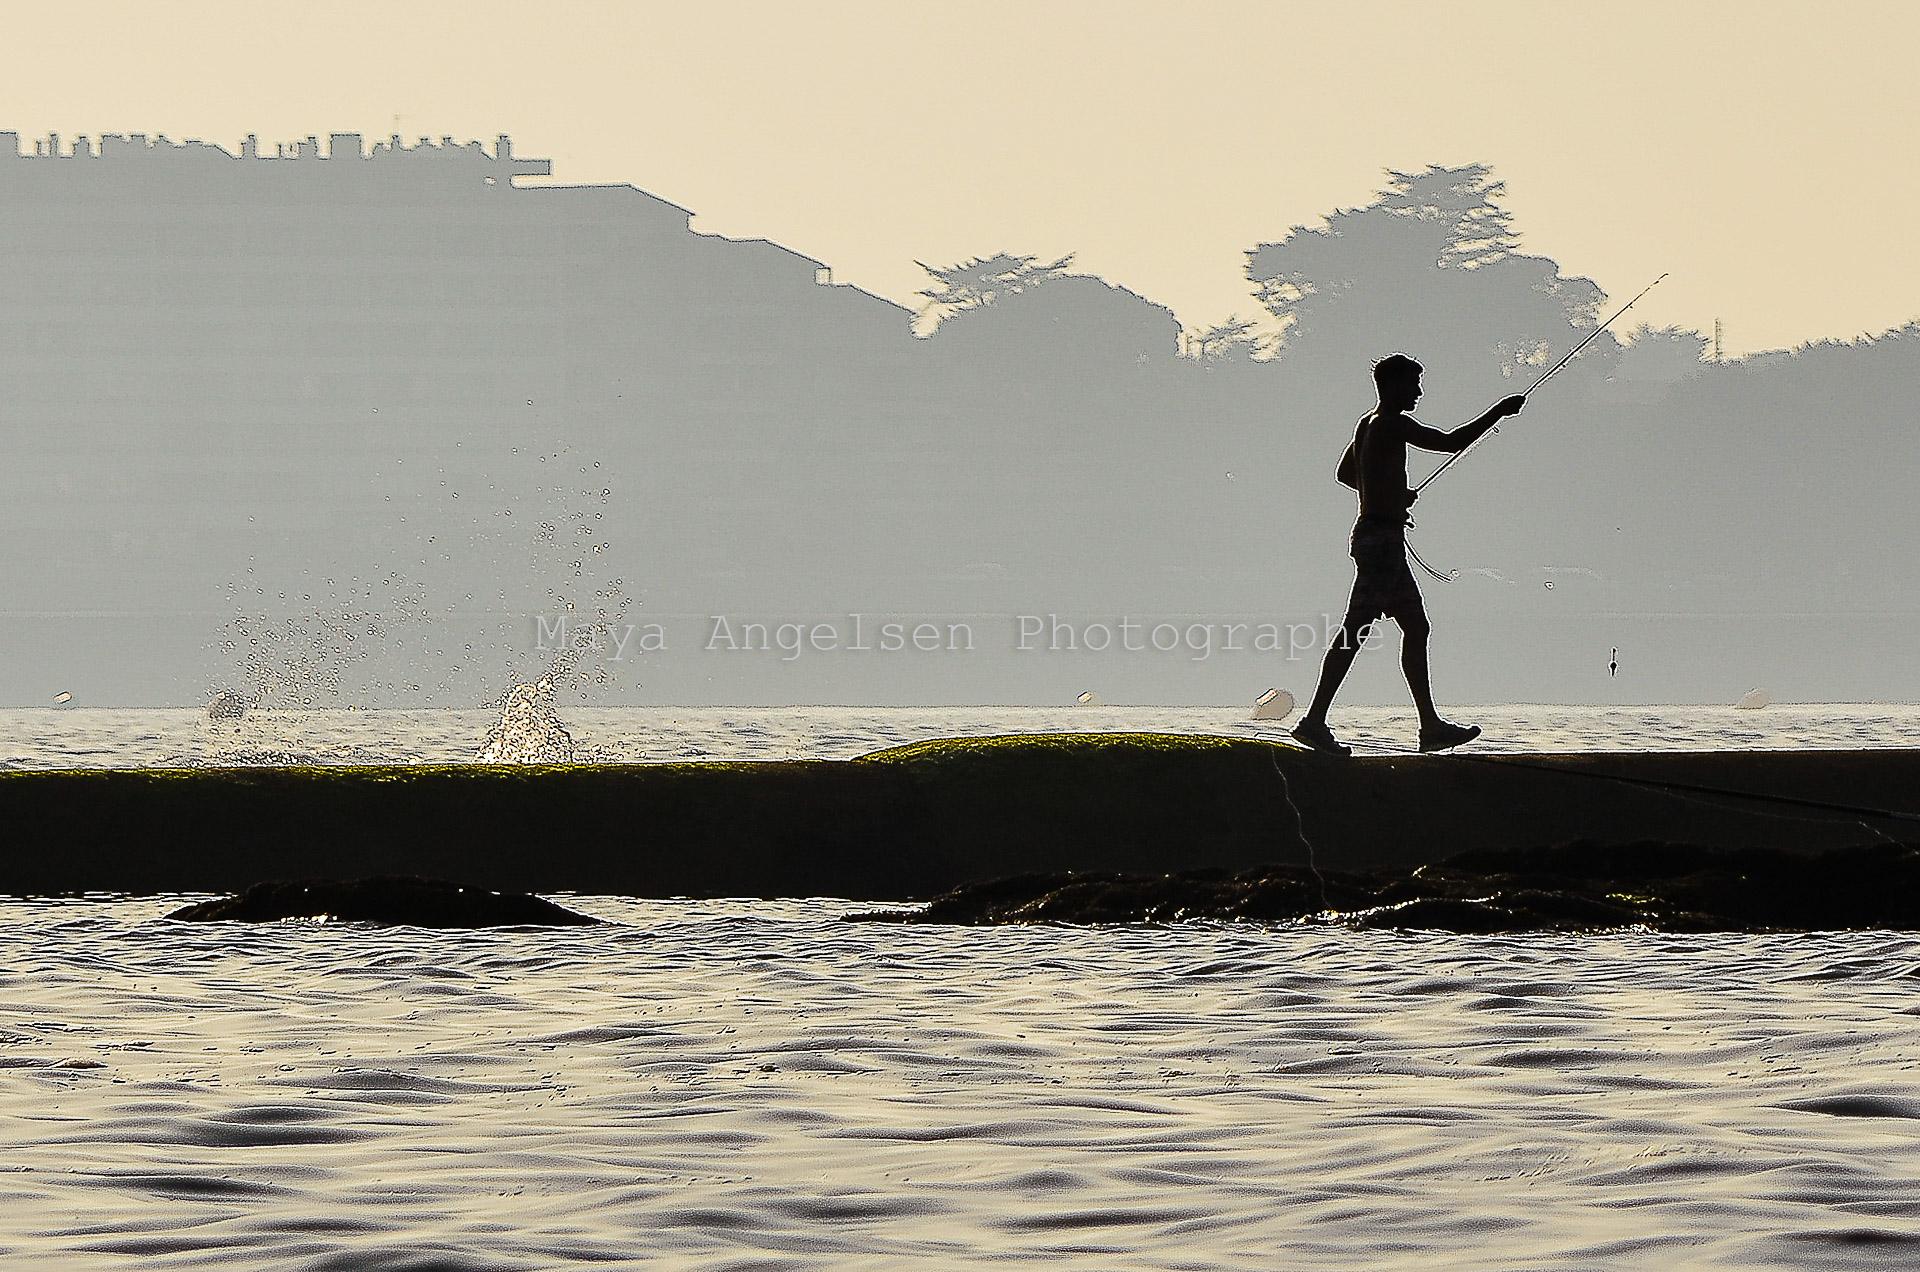 photographe-streetart-maya-angelsen-le-pêcheur-les-sables-d-olonne